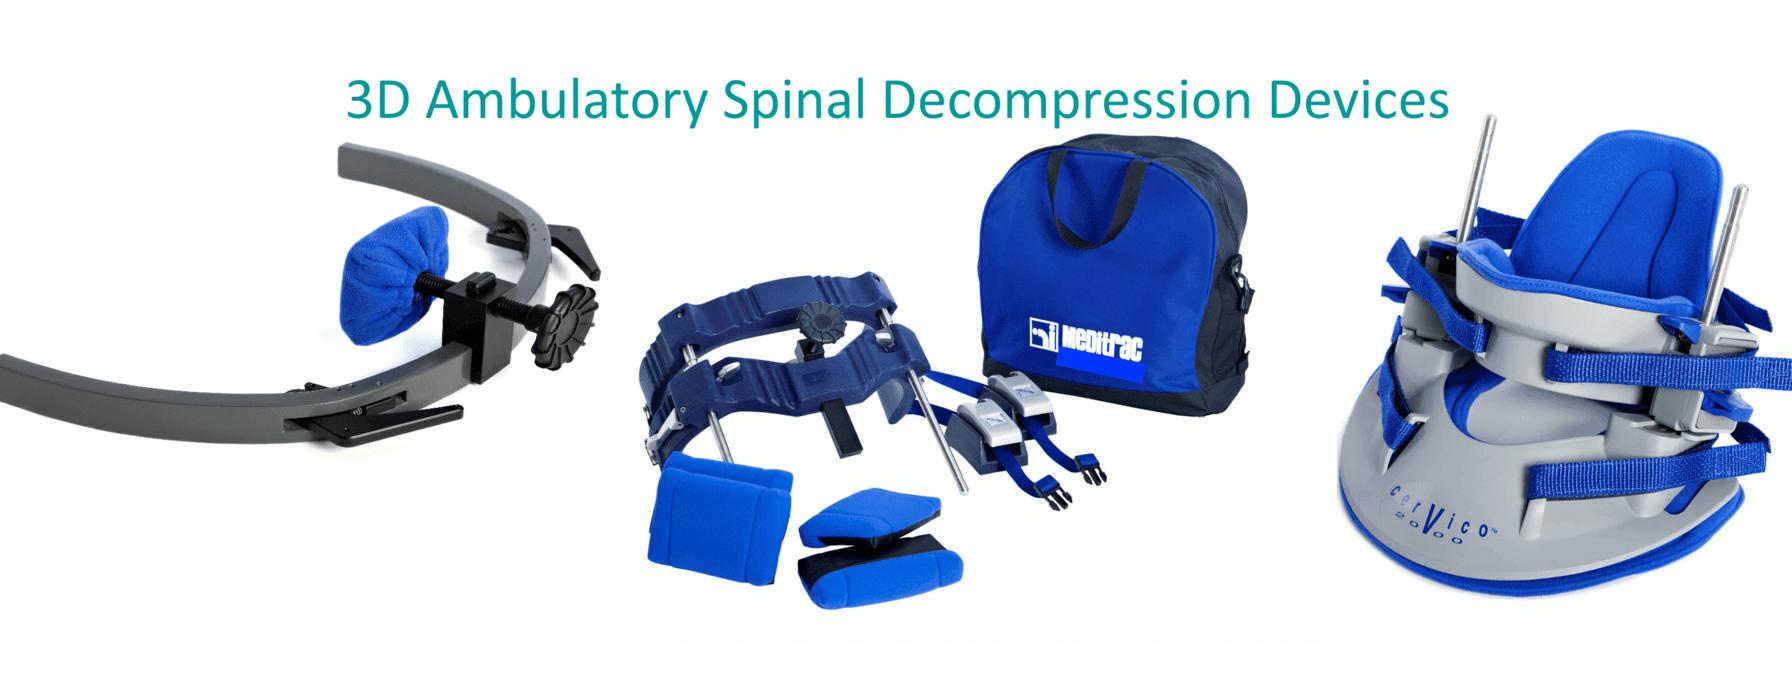 Meditrac 3D Ambulatory Spinal Decompression Devices, including the Vertetrac spinal decompression device, Cervico 2000 & DBS Scoliosis Rail Attachment, for neck & lower back pain relief, vertetrac disc bulges